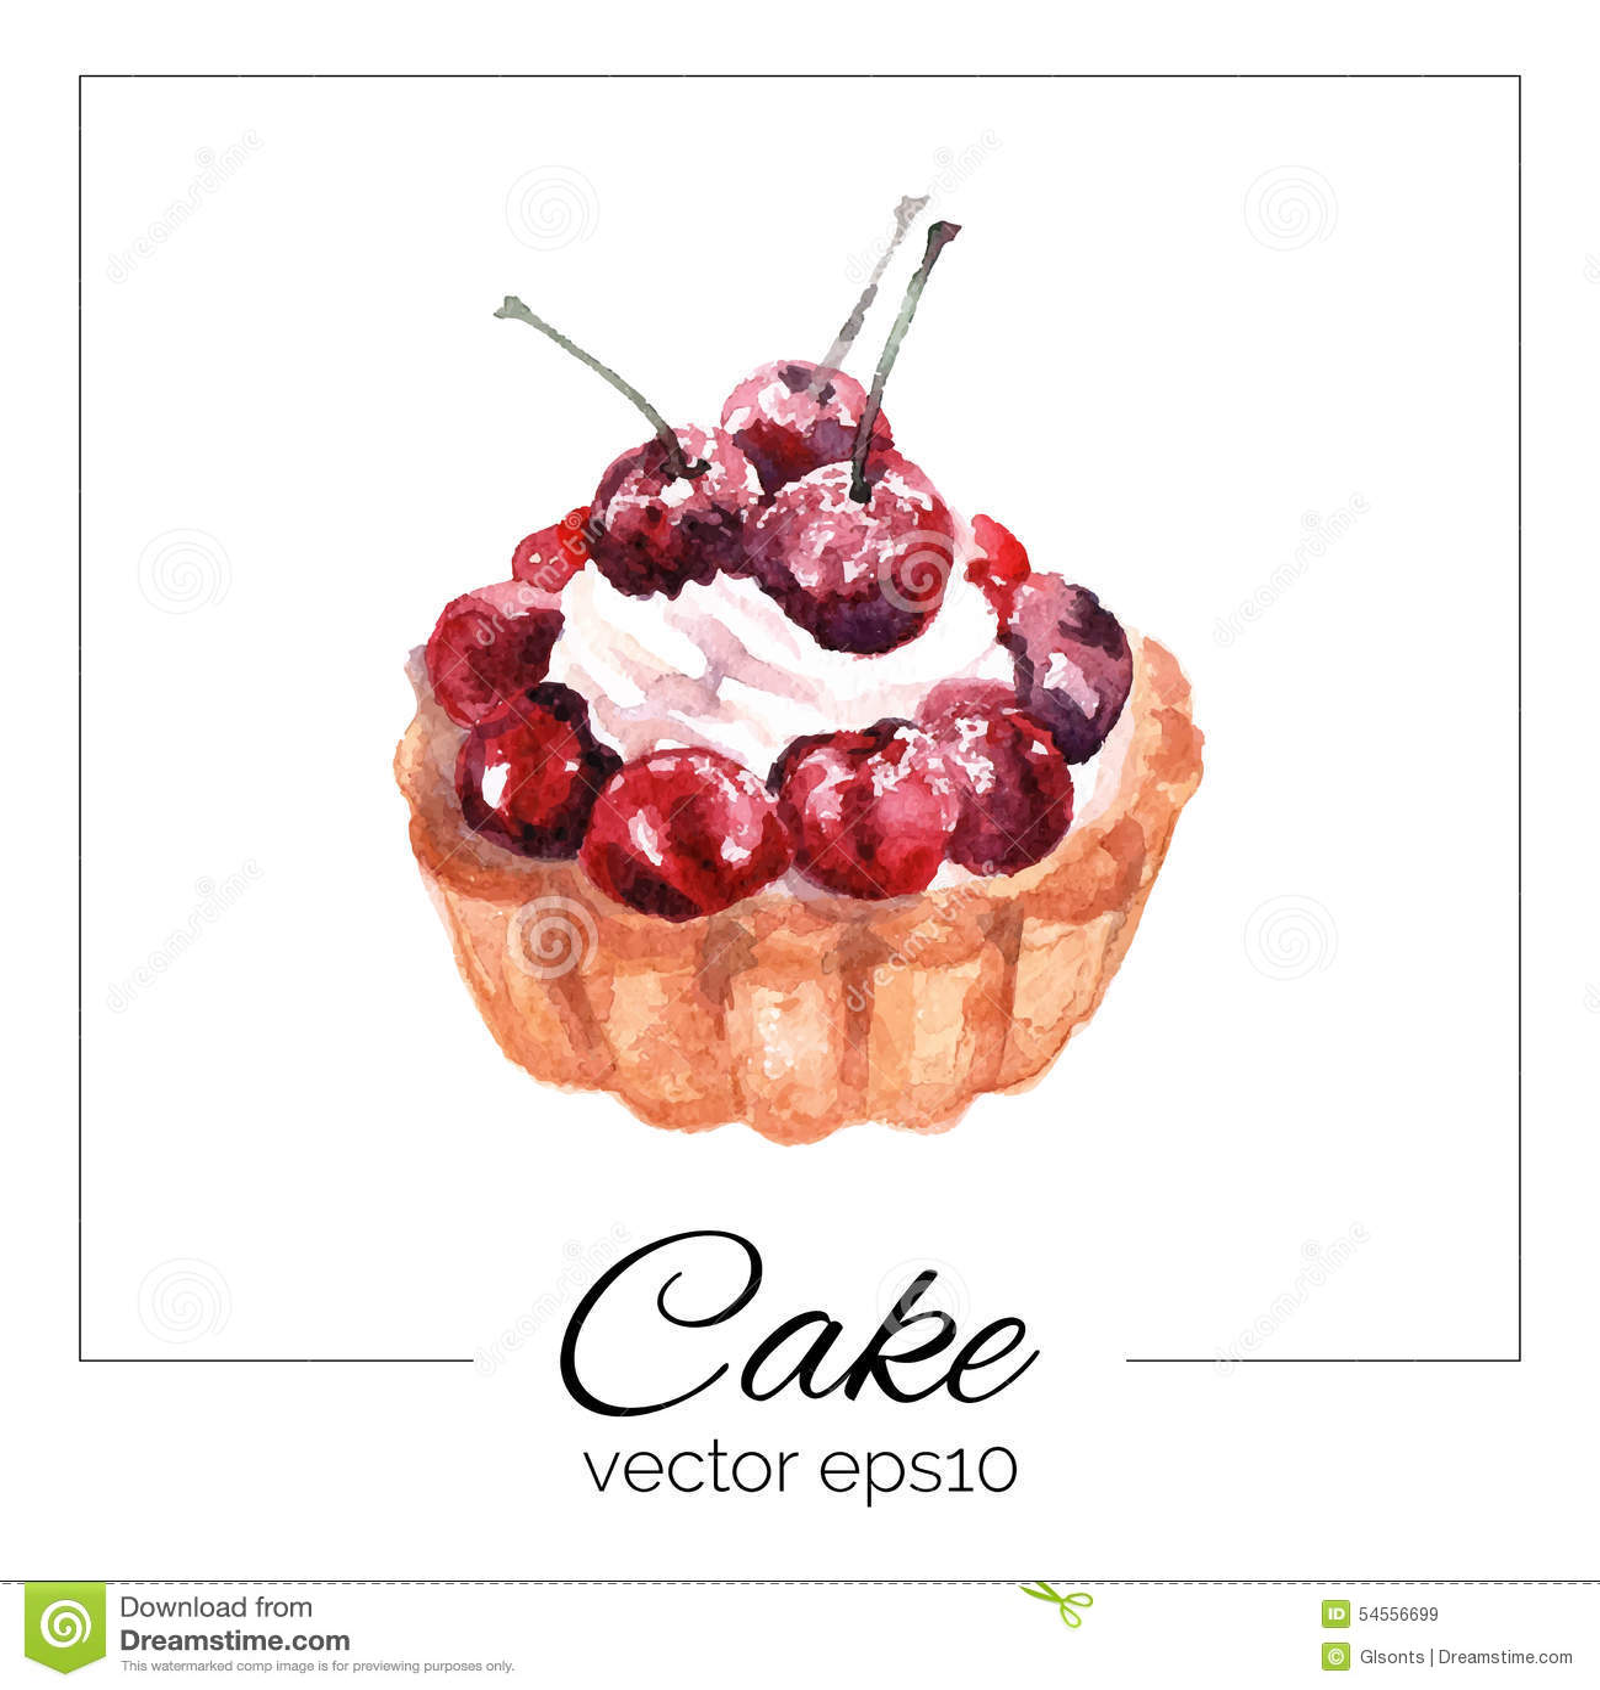 тортик нарисованный картинки